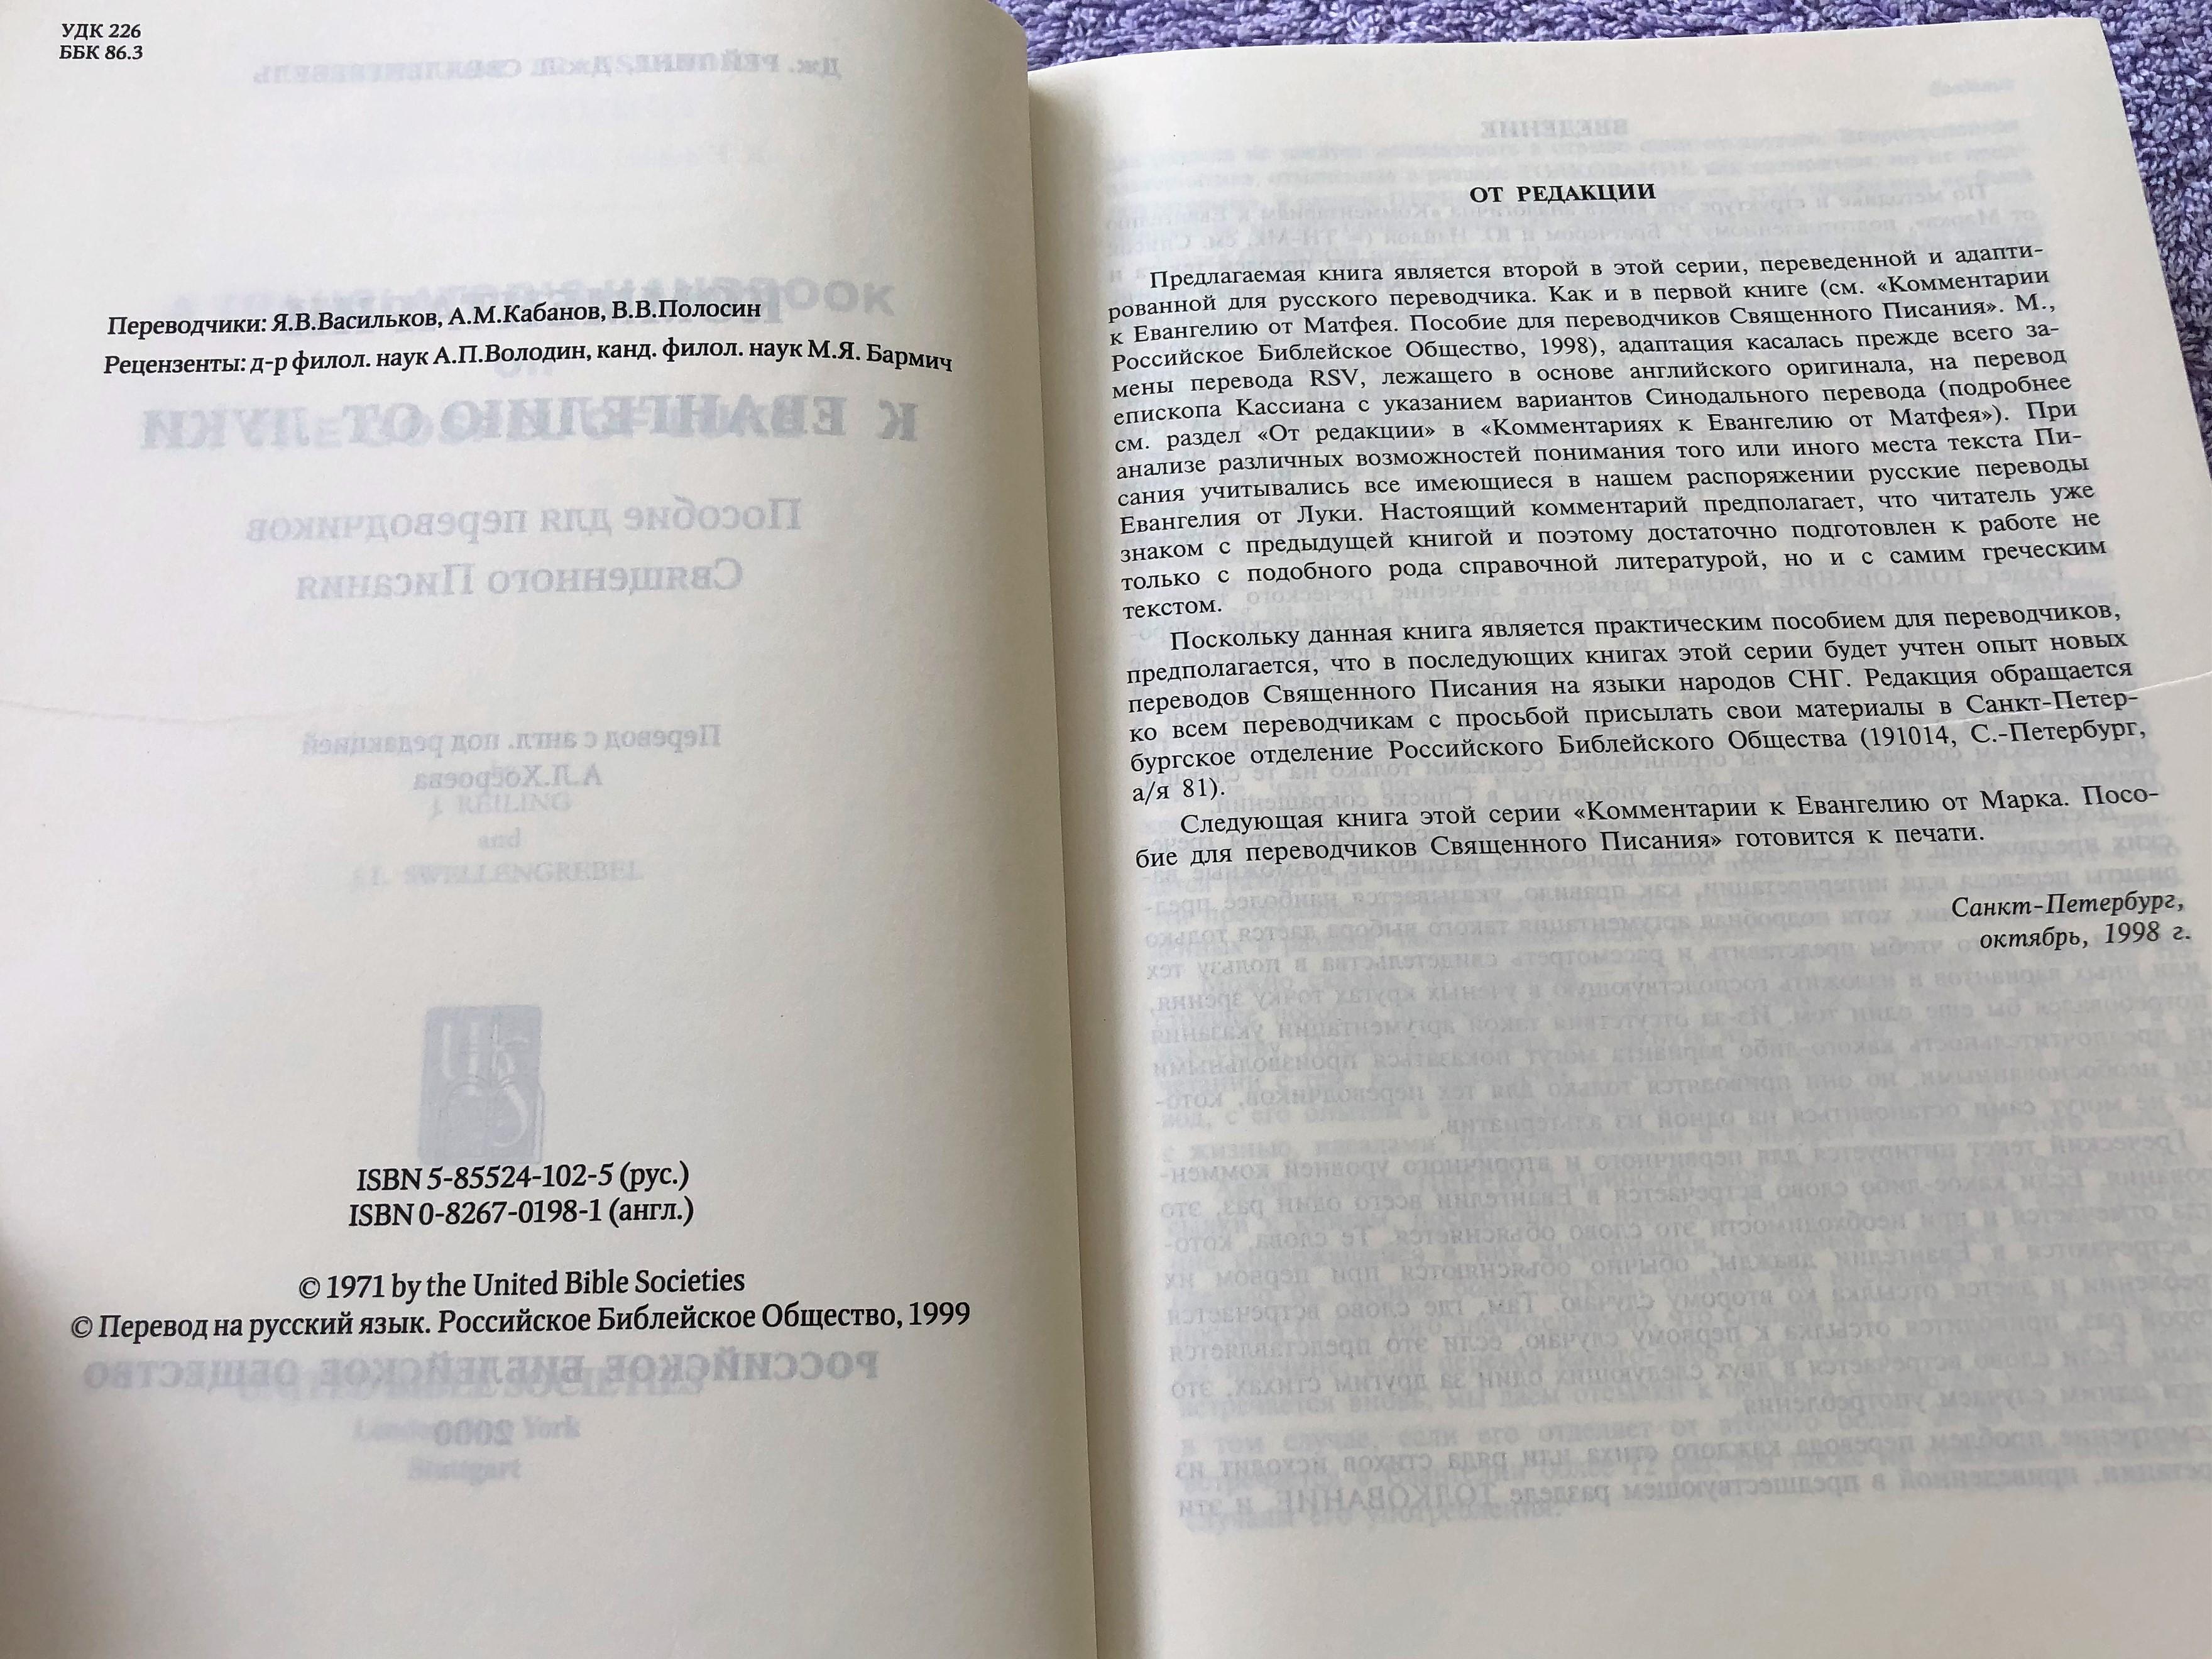 russian-language-edition-of-the-helps-for-bible-translators-a-translator-s-handbook-on-the-gospel-of-luke-4-.jpg